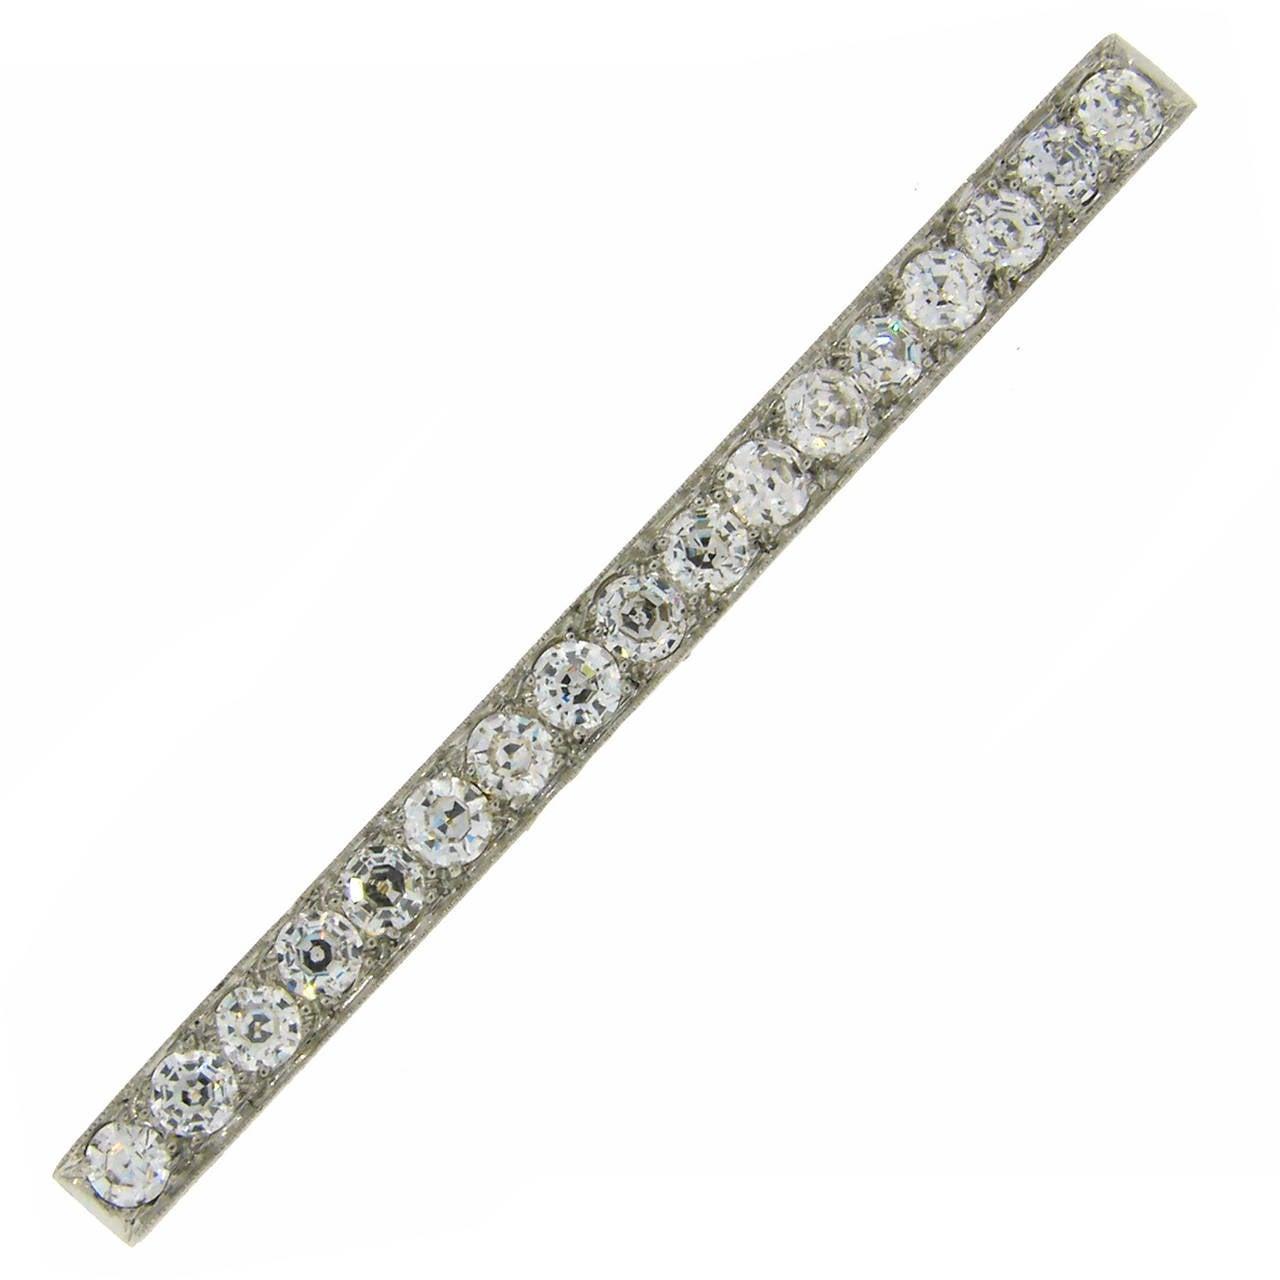 Tiffany & Co. Art Deco Diamond Platinum Tie Bar Pin Brooch For Sale